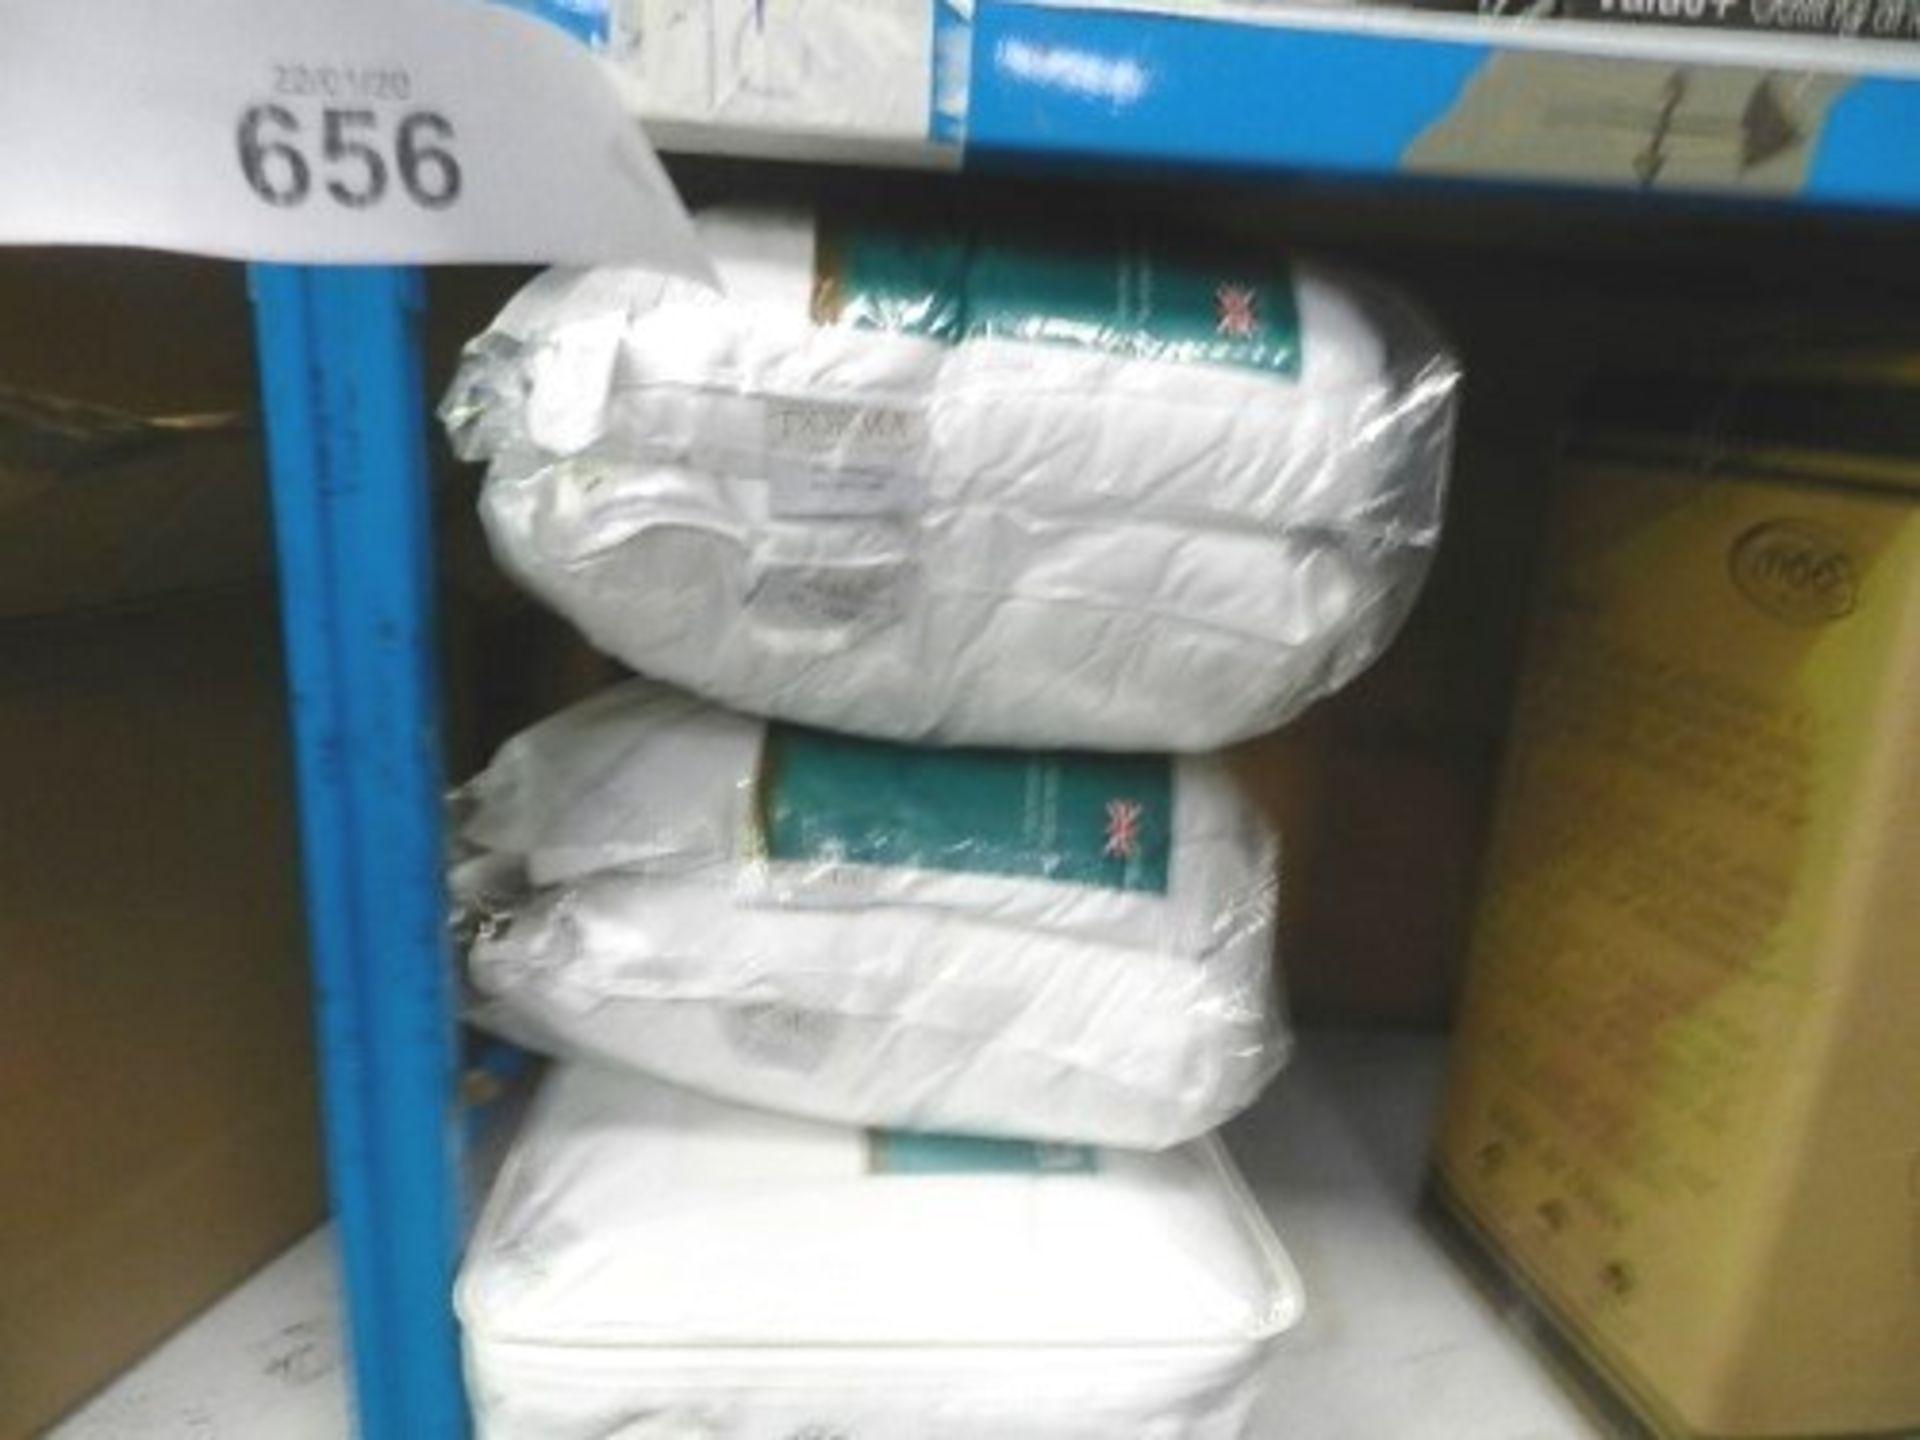 Lot 656 - 1 x Dorma full forever mattress topper, RRP £55.00 together with 2 x packs of Dorma full forever